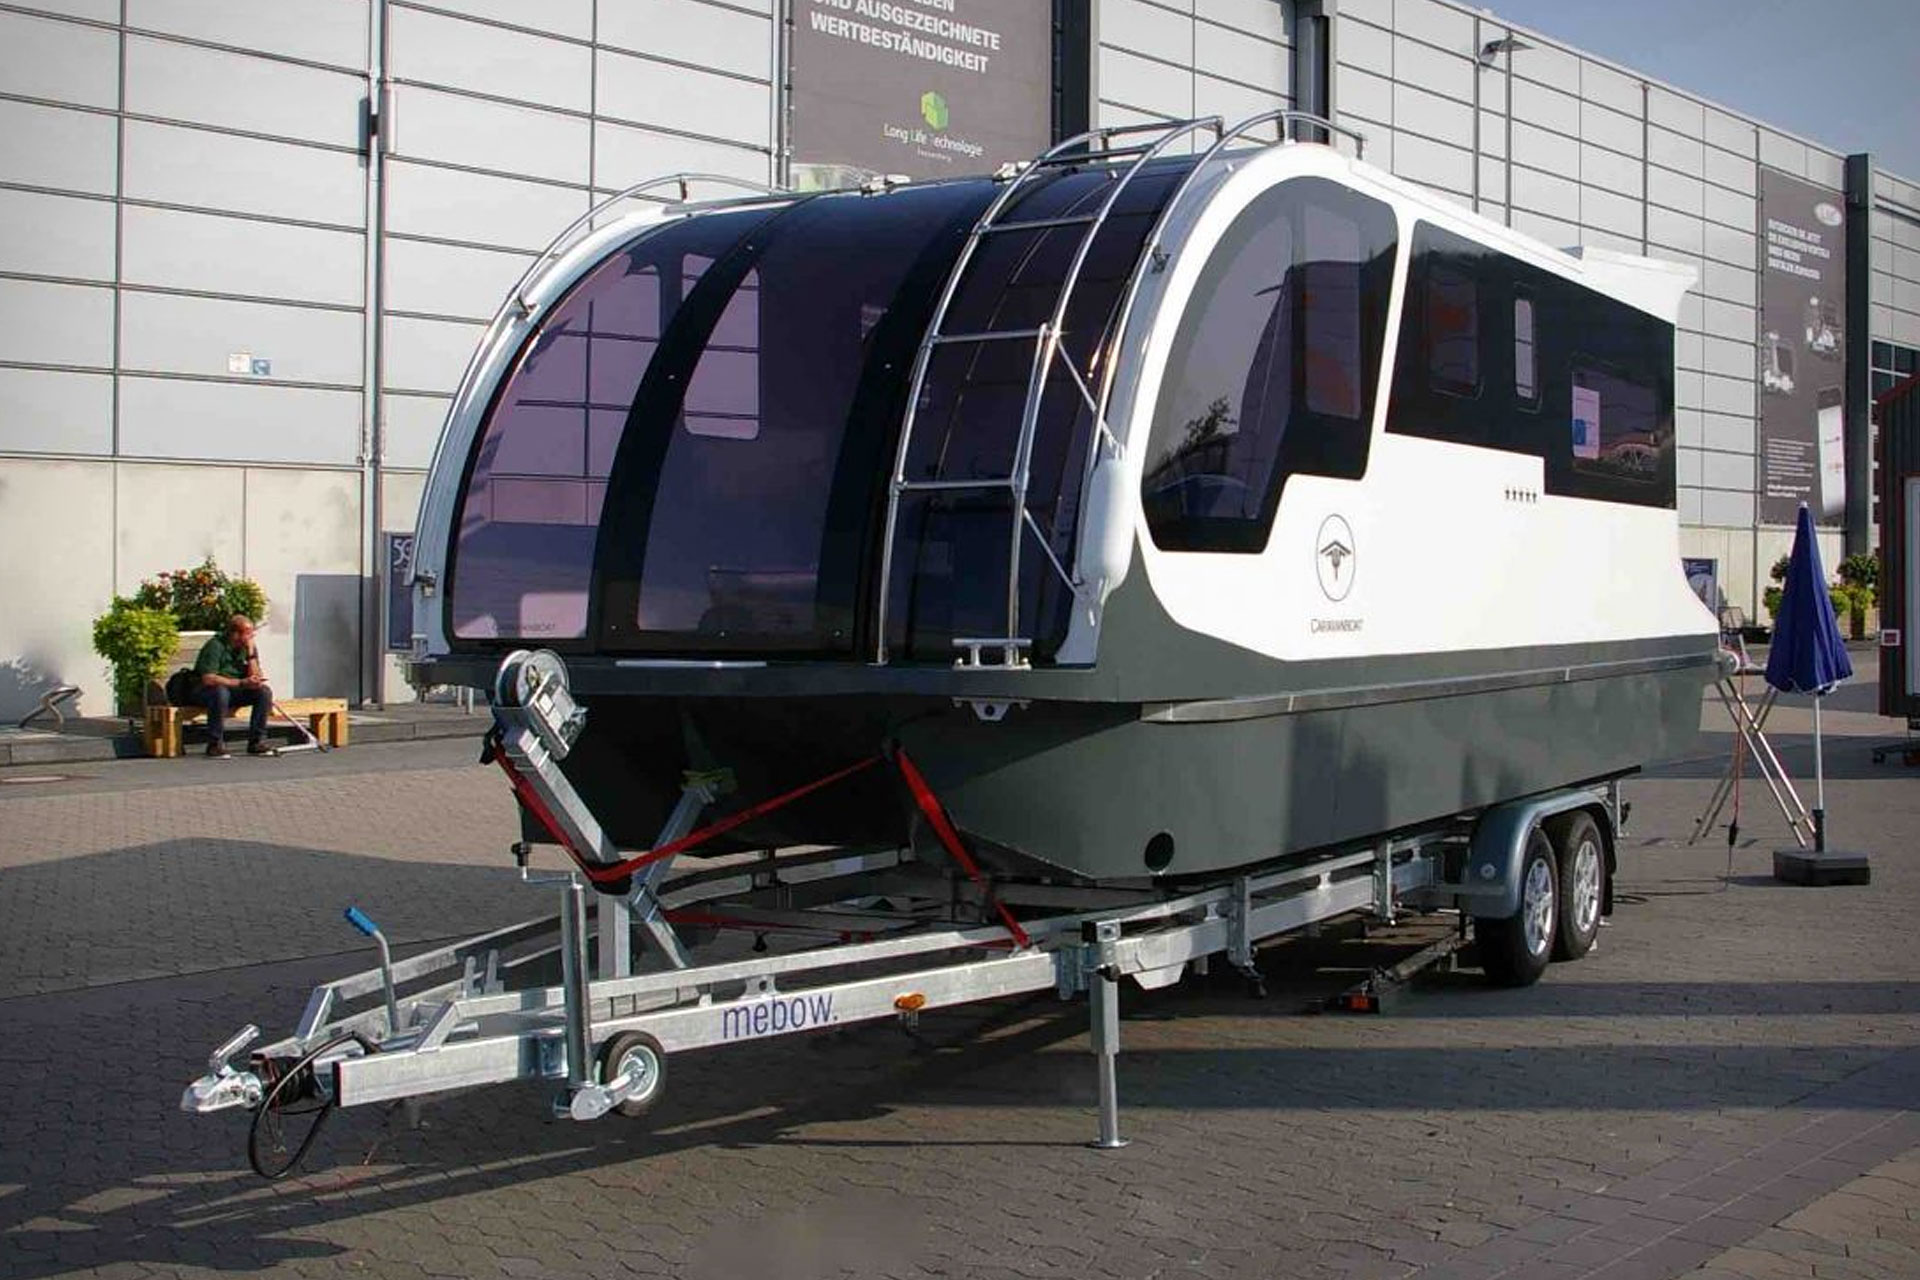 Caravanboat Amphibious Camper